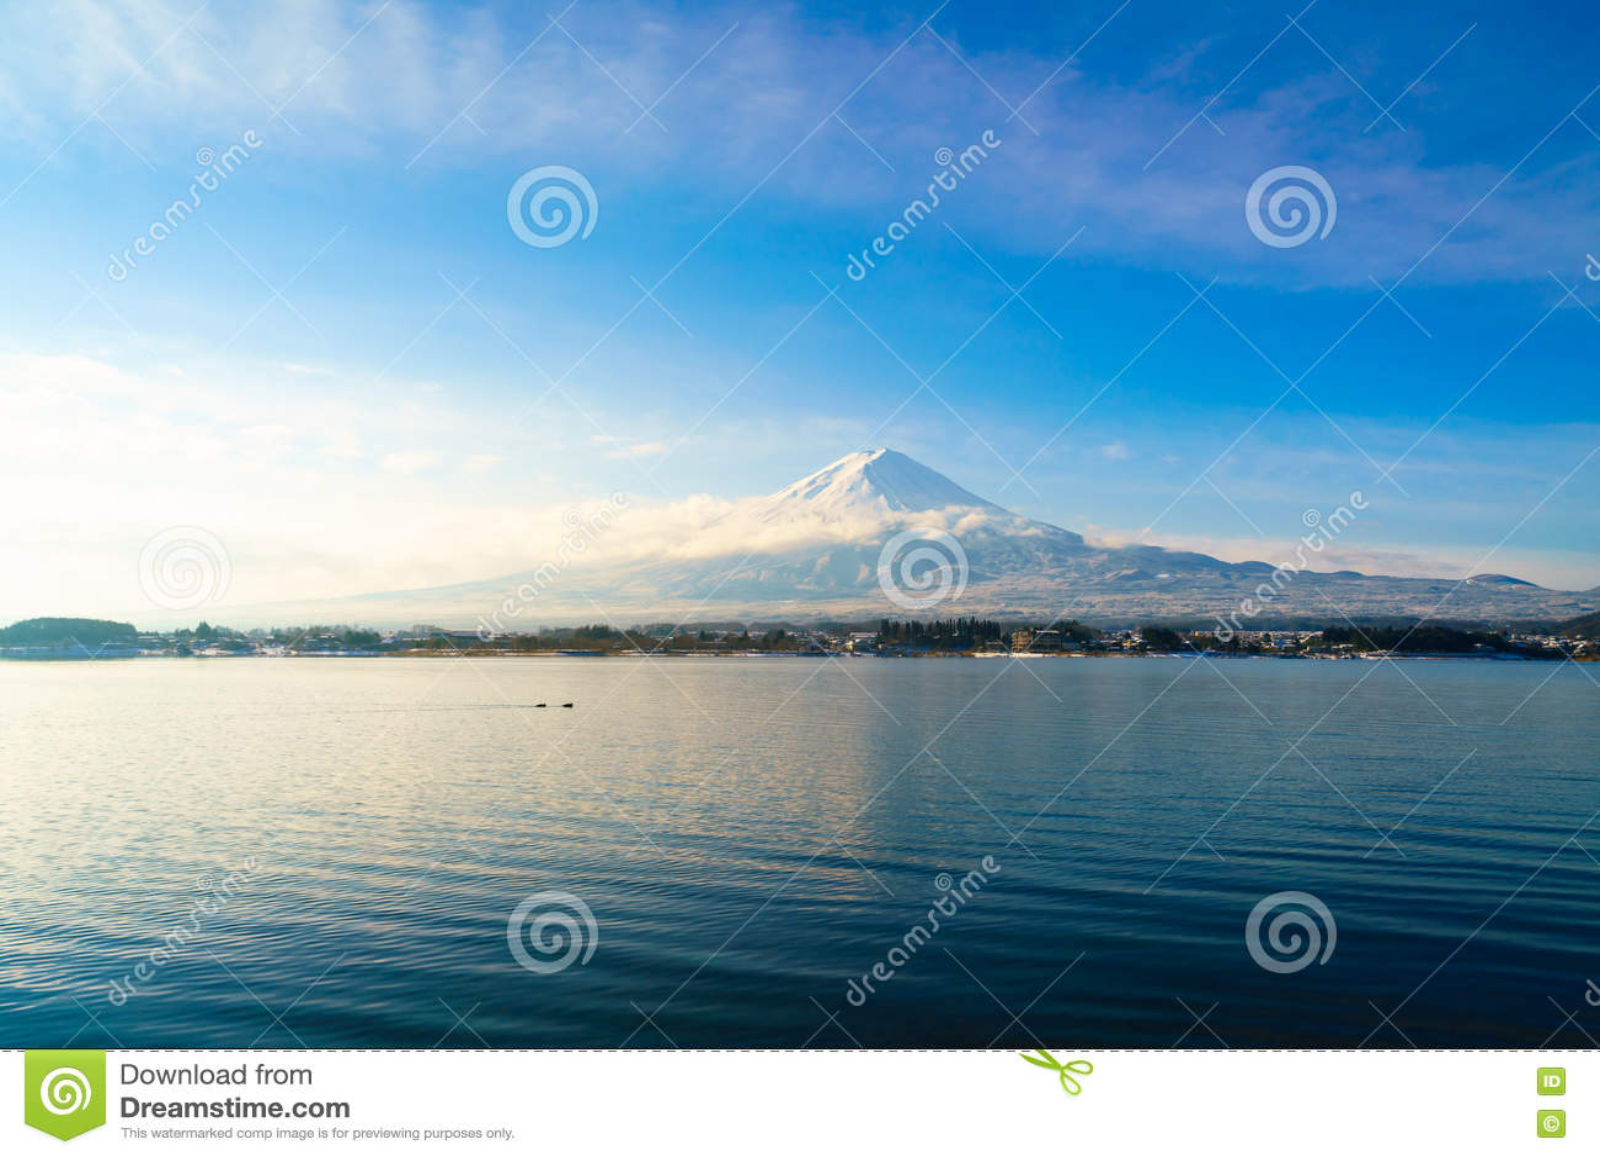 Mountain fuji and lake kawaguchi, Japan .